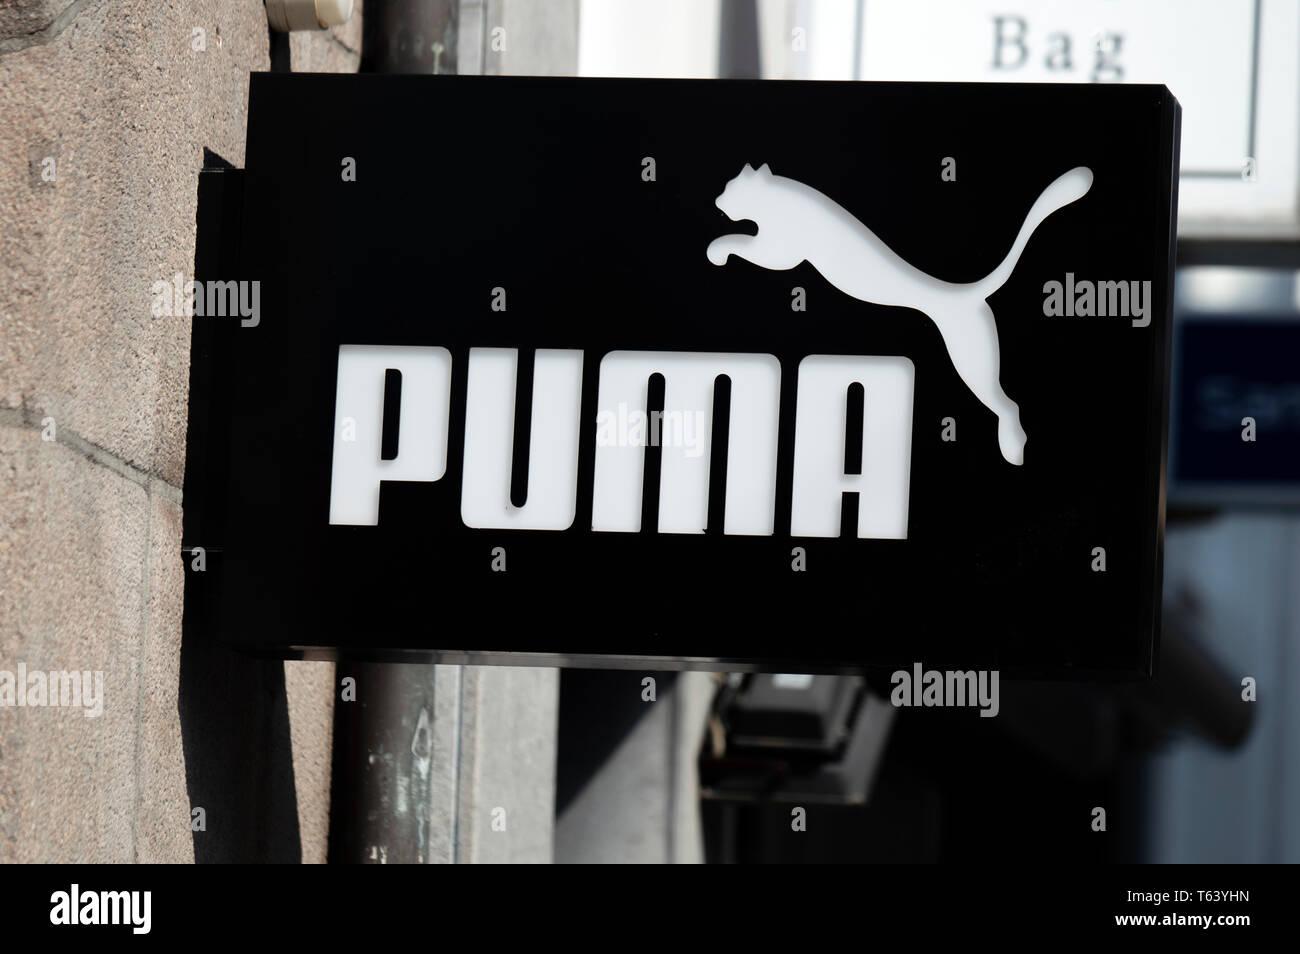 Puma Brand Stockfotos & Puma Brand Bilder Alamy